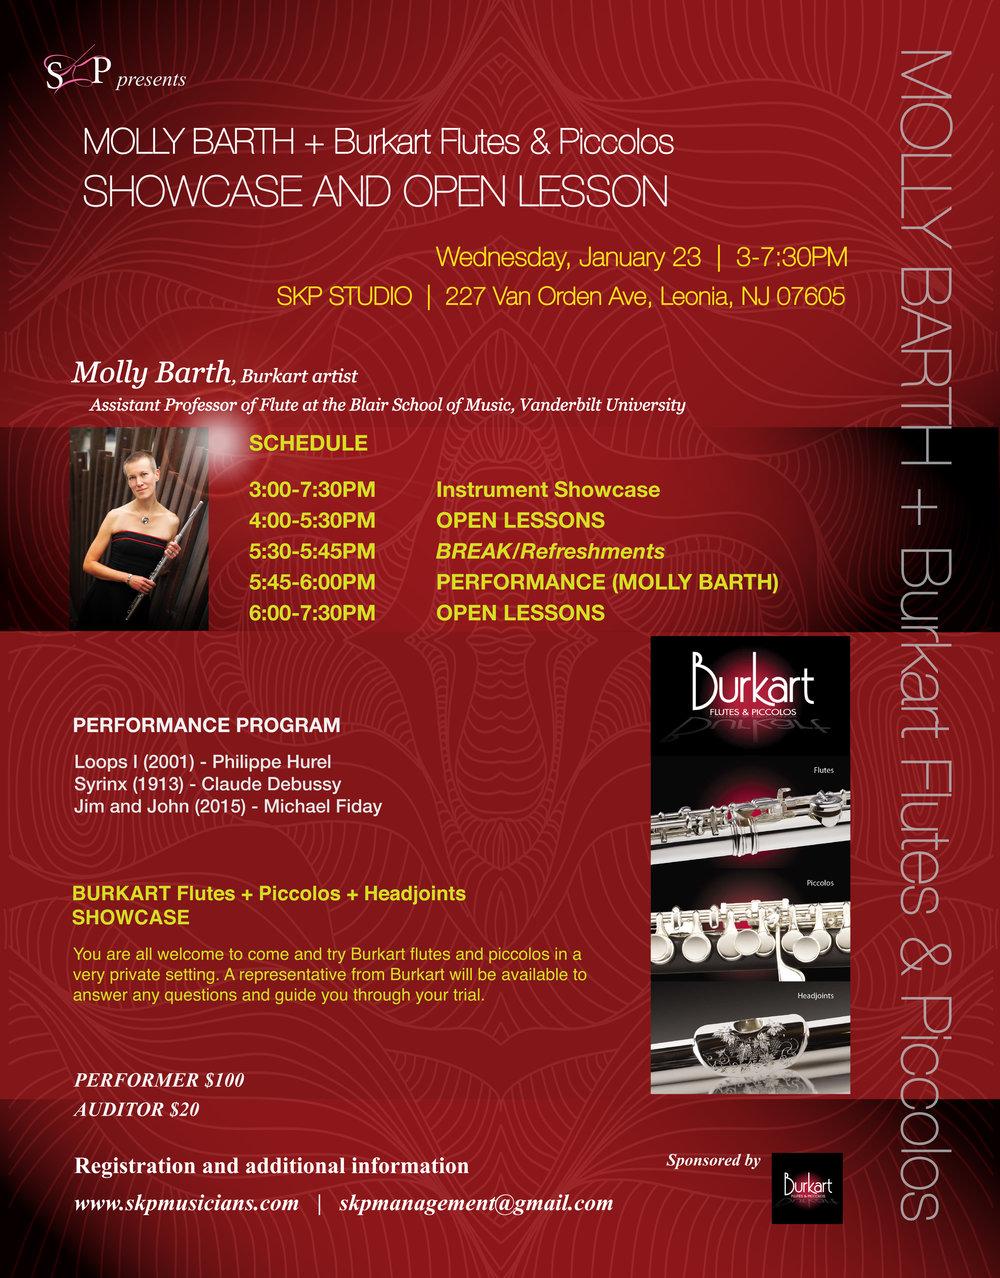 Molly Barth + Burkart Flutes & Piccolos